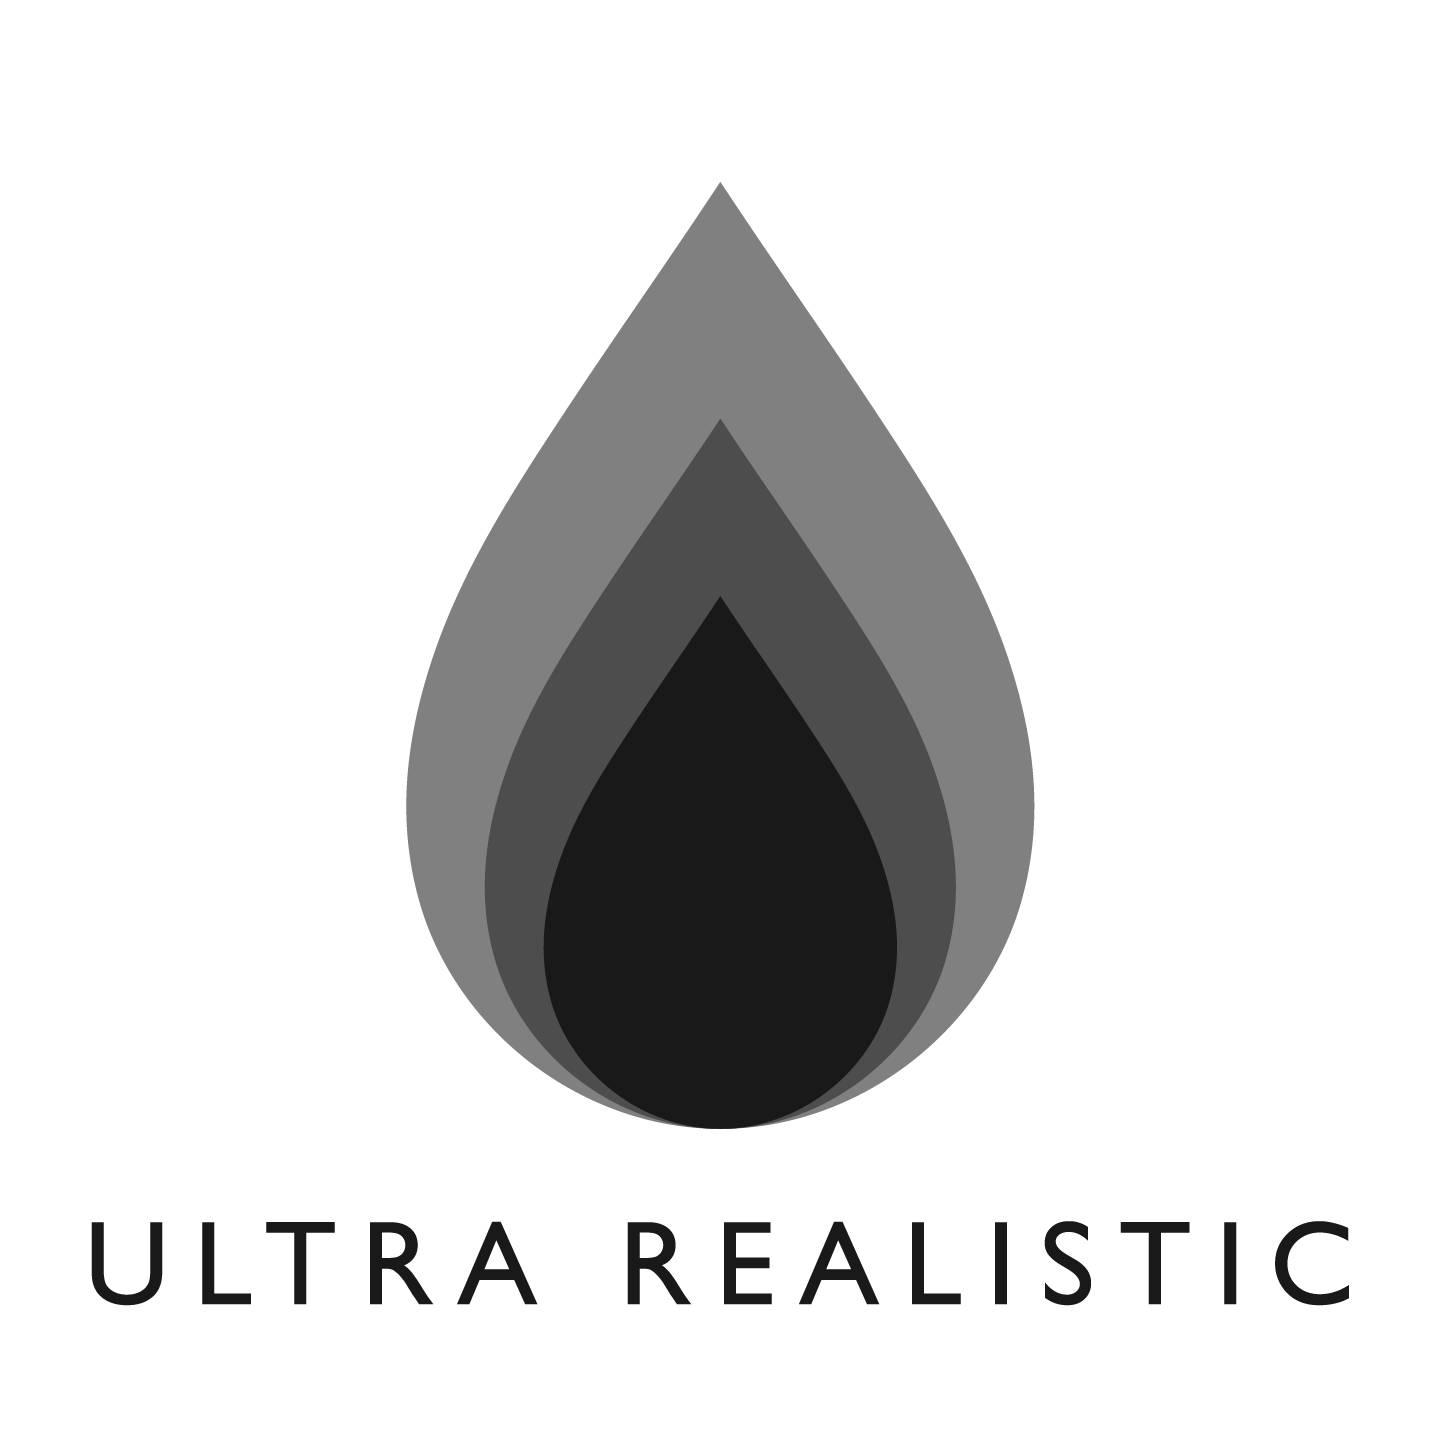 Ultra realistic